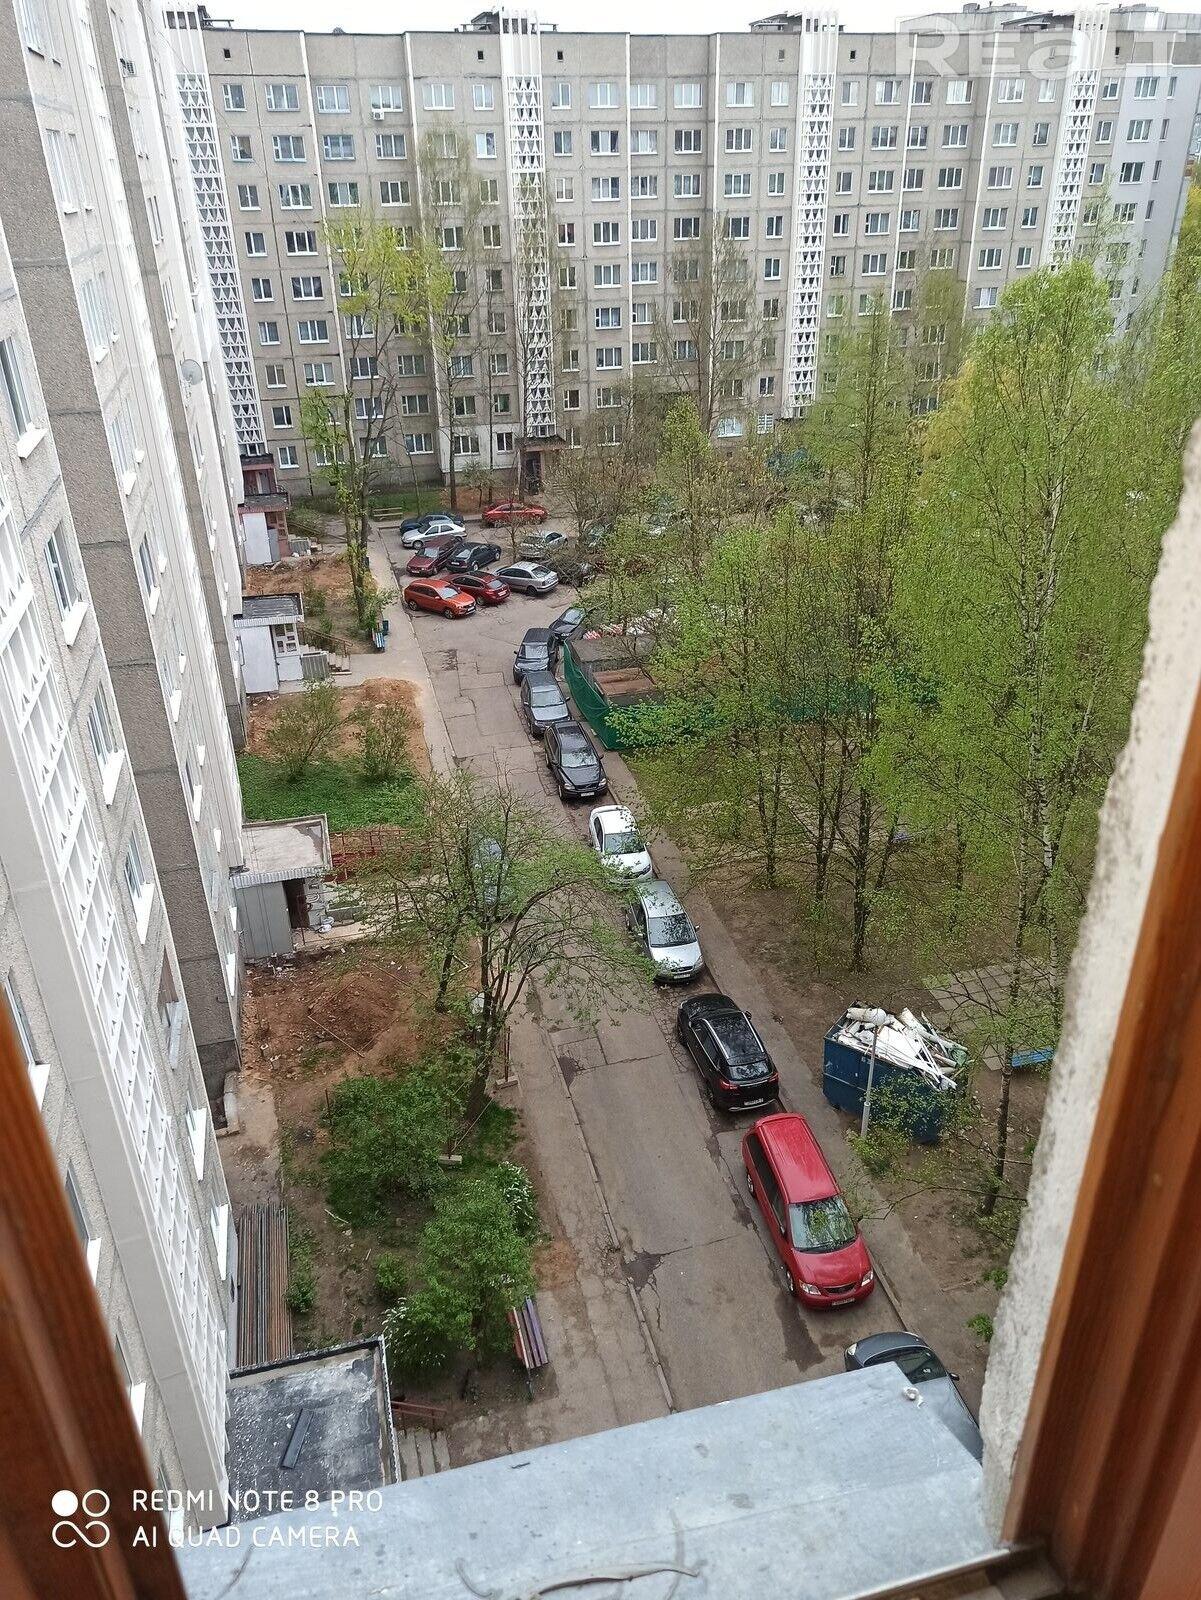 Продается комната в 2-х комнатной квартире, просп. Любимова д.12 - фото №23